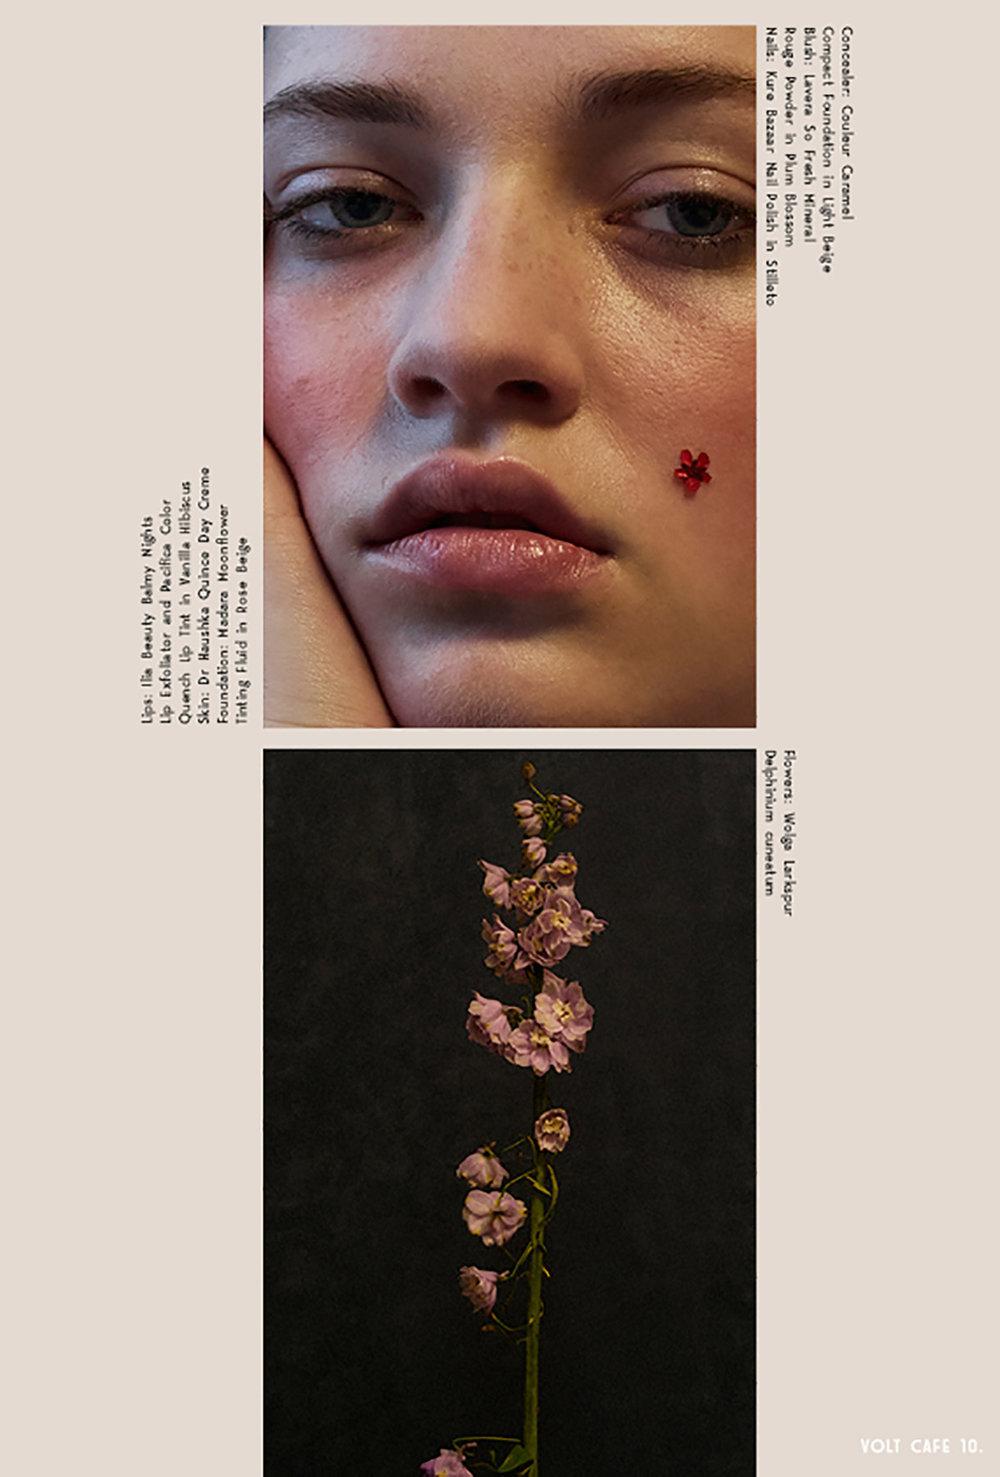 038-icon-artist-management-Kristin-Vicari-Beauty-Volt.jpg